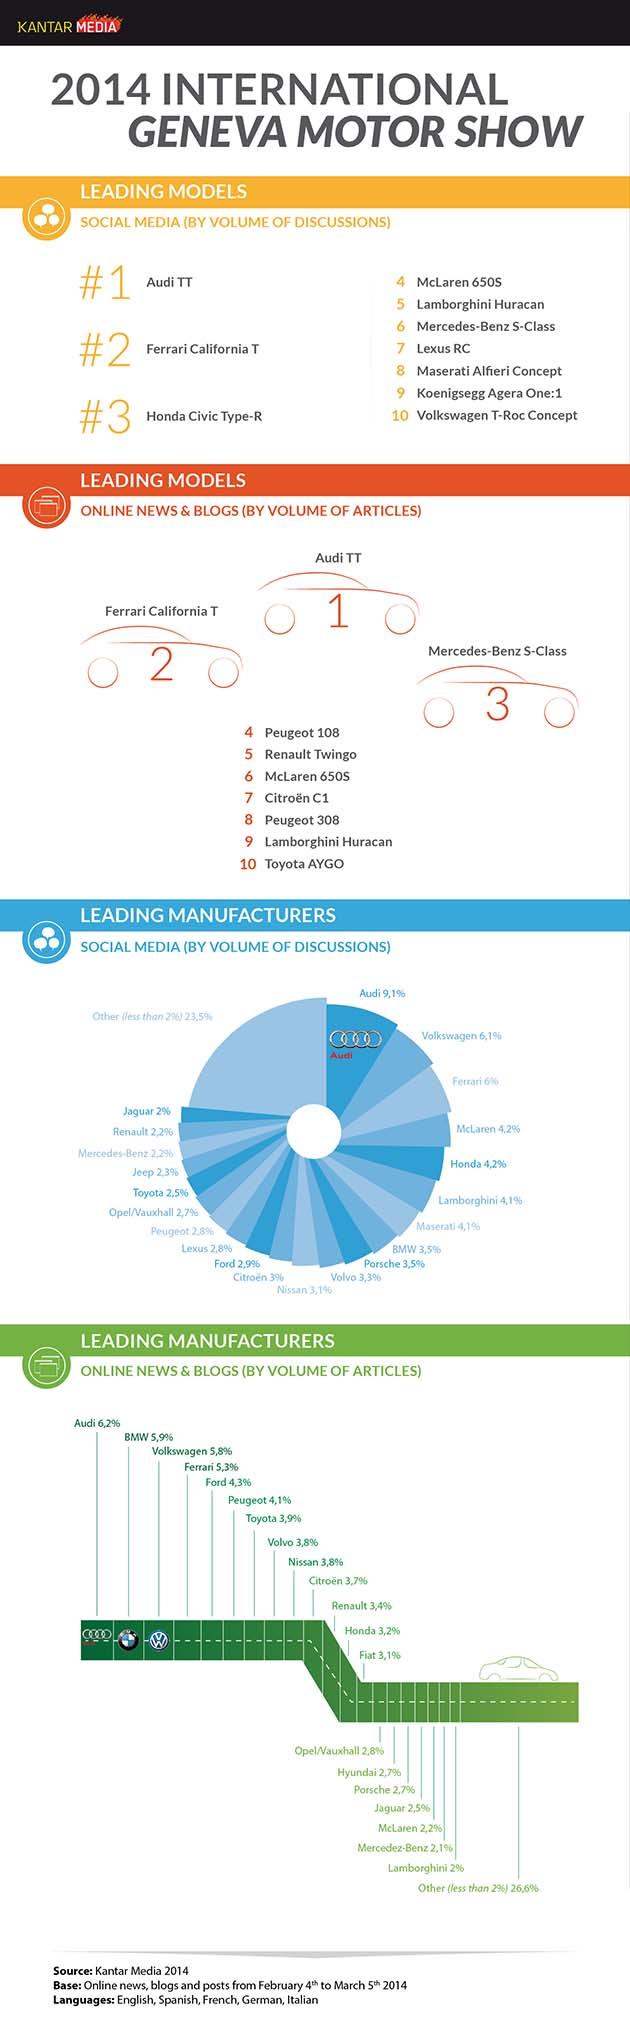 Geneva Motor Show 2014 Kantar analysis